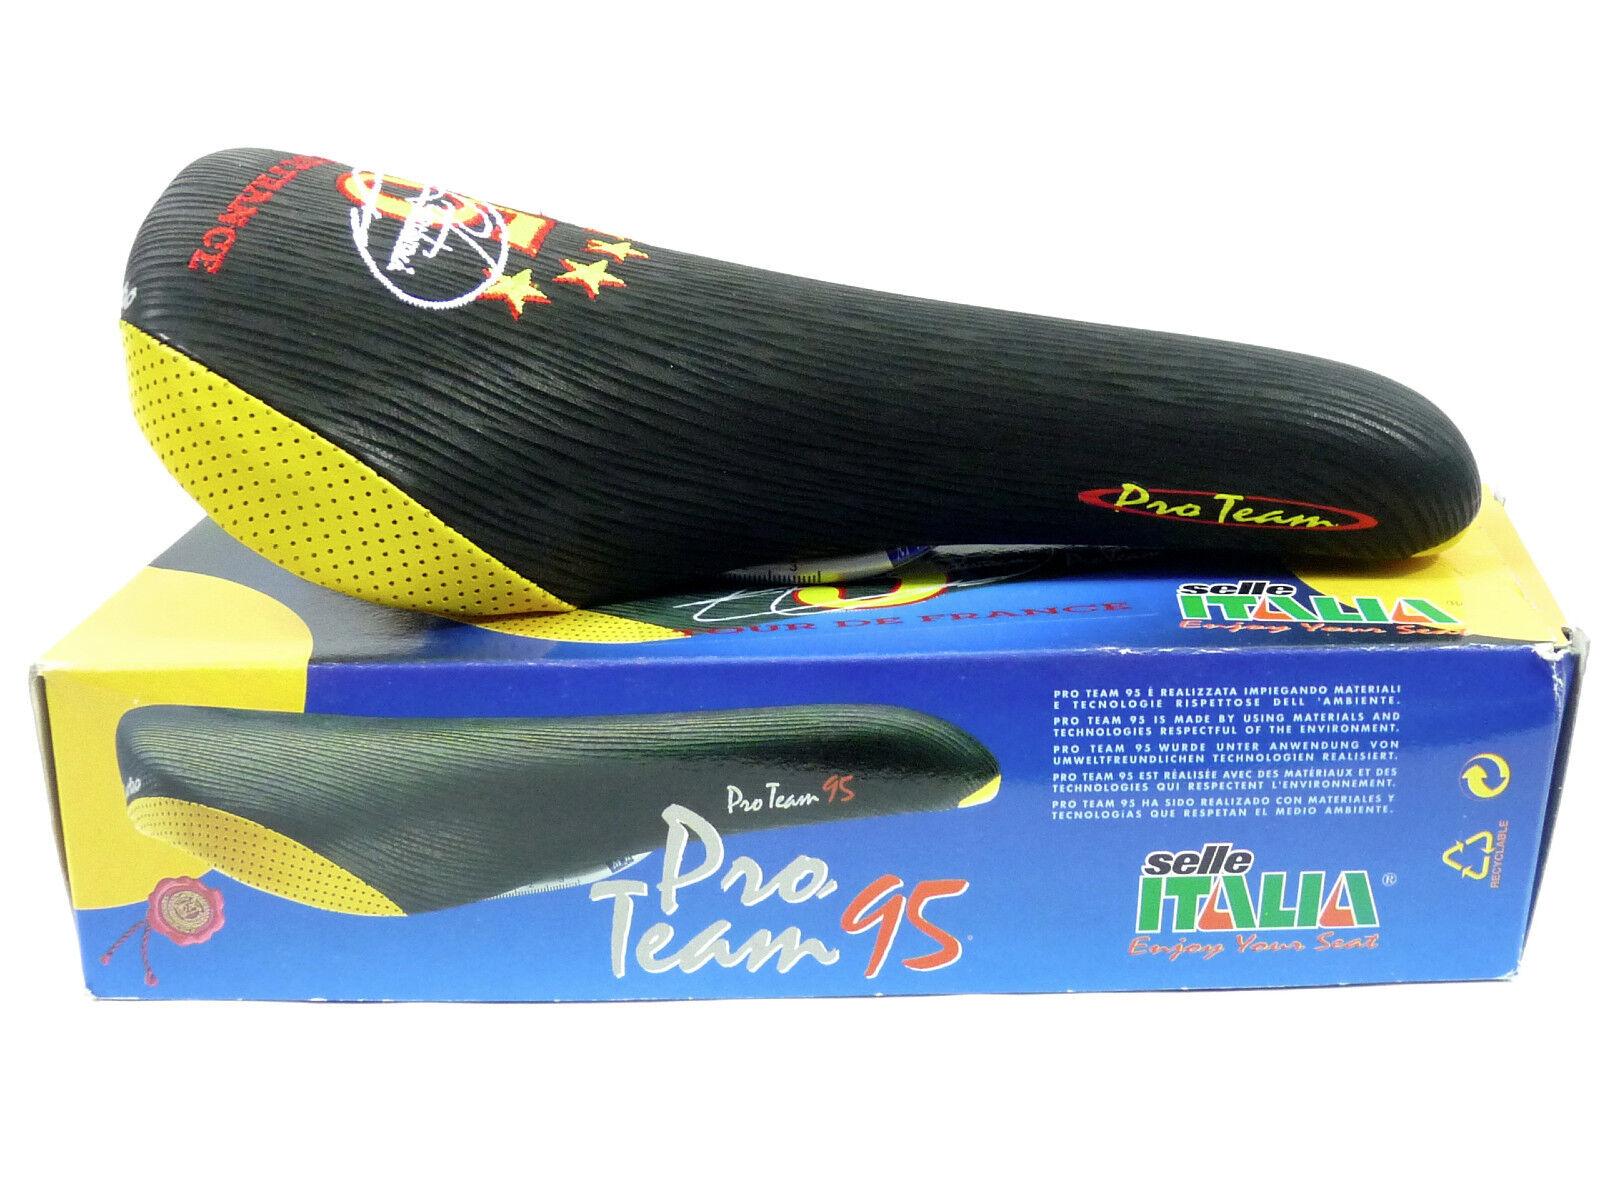 Turbo Saddle Selle Italia Pro Team Tdf Miguel  Indurain 5 Wins 91'-95' bike NOS  at cheap